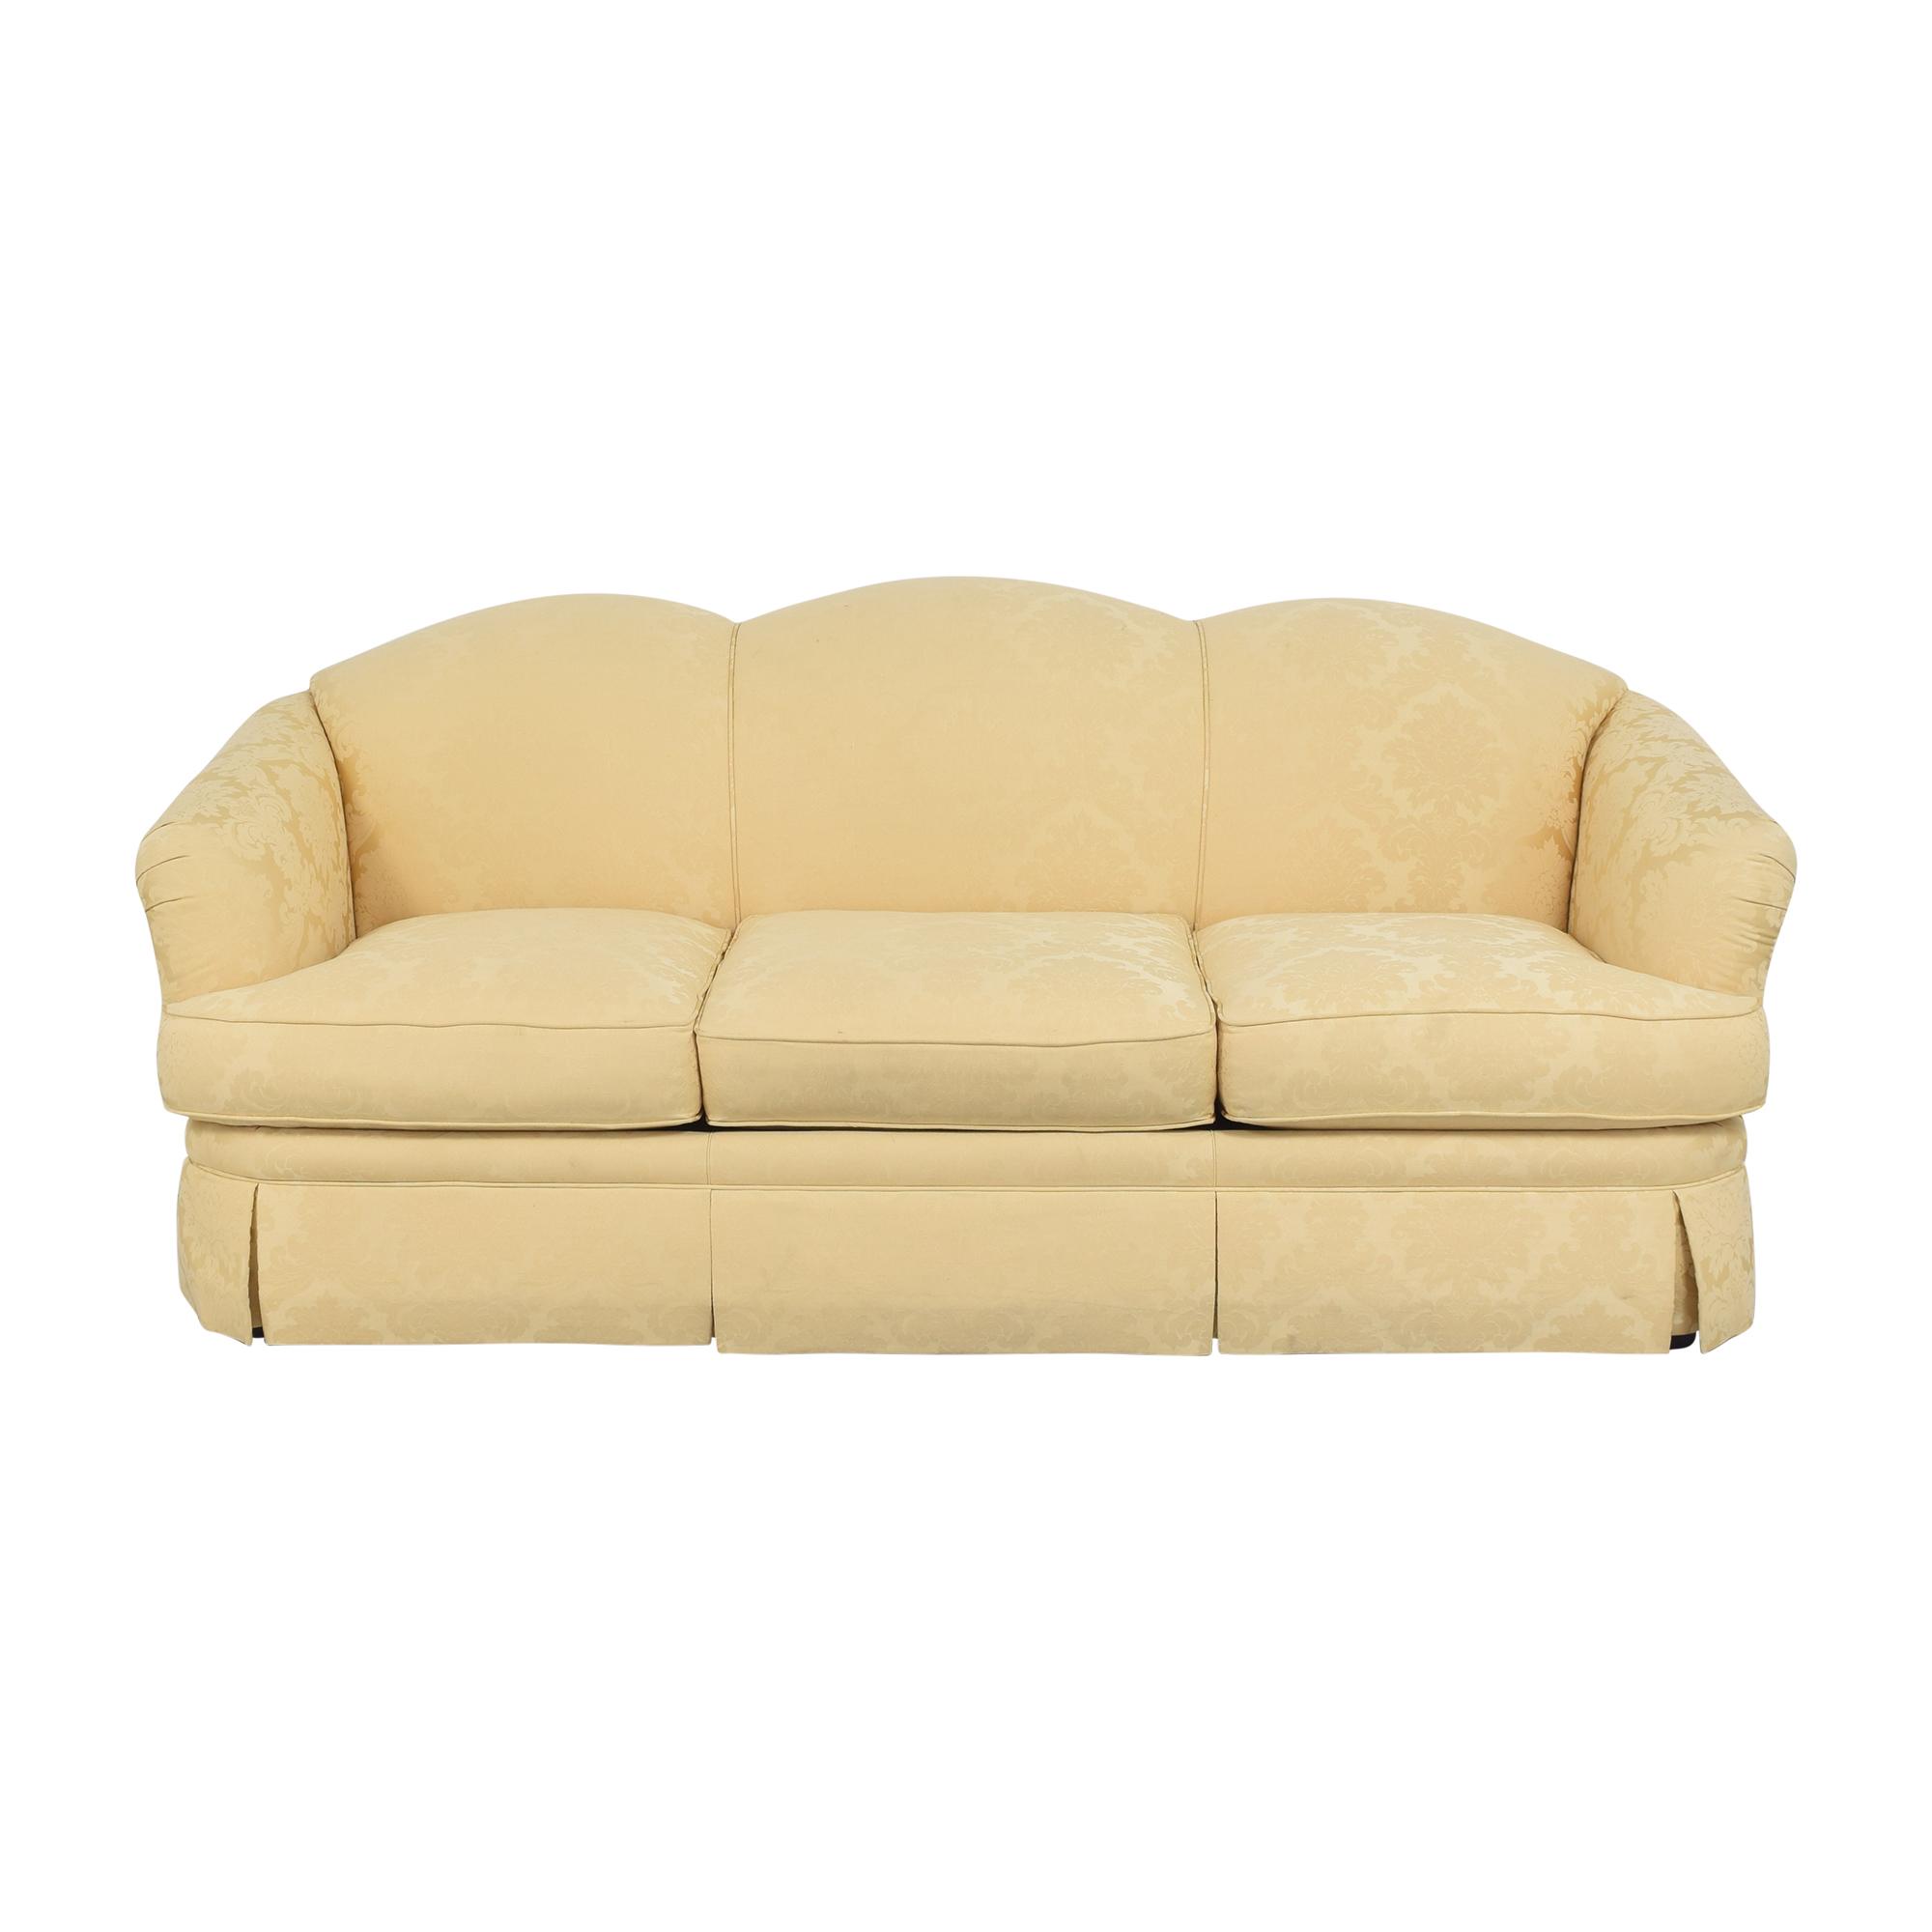 shop Thomasville Scalloped Three Cushion Sofa Thomasville Sofas